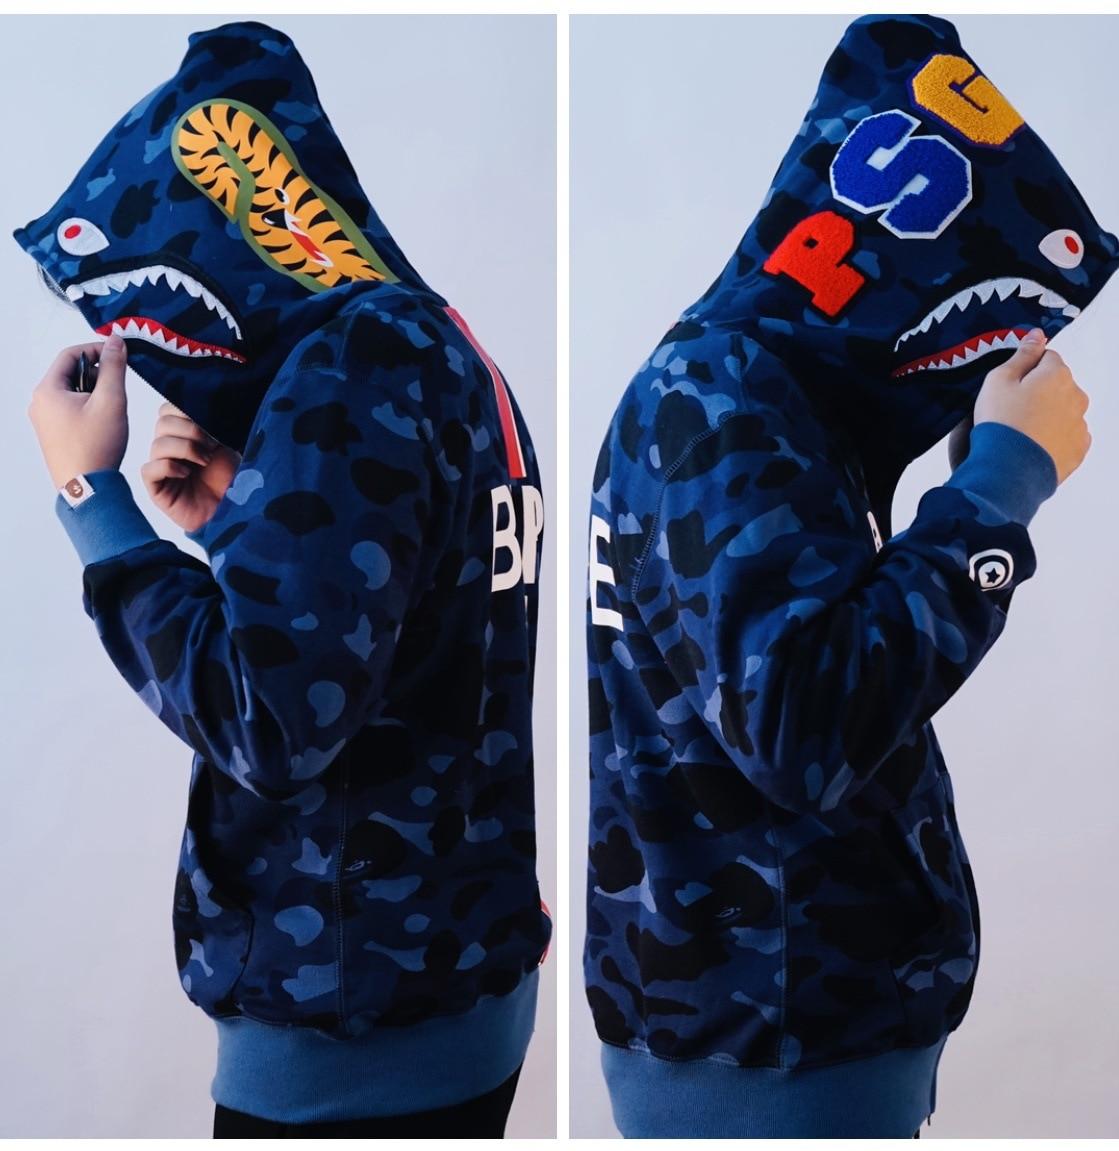 Japanese-style Popular Brand Teenager Students Hot Selling Physical Store Hoodie Men's Sweatshirts & Hoodies